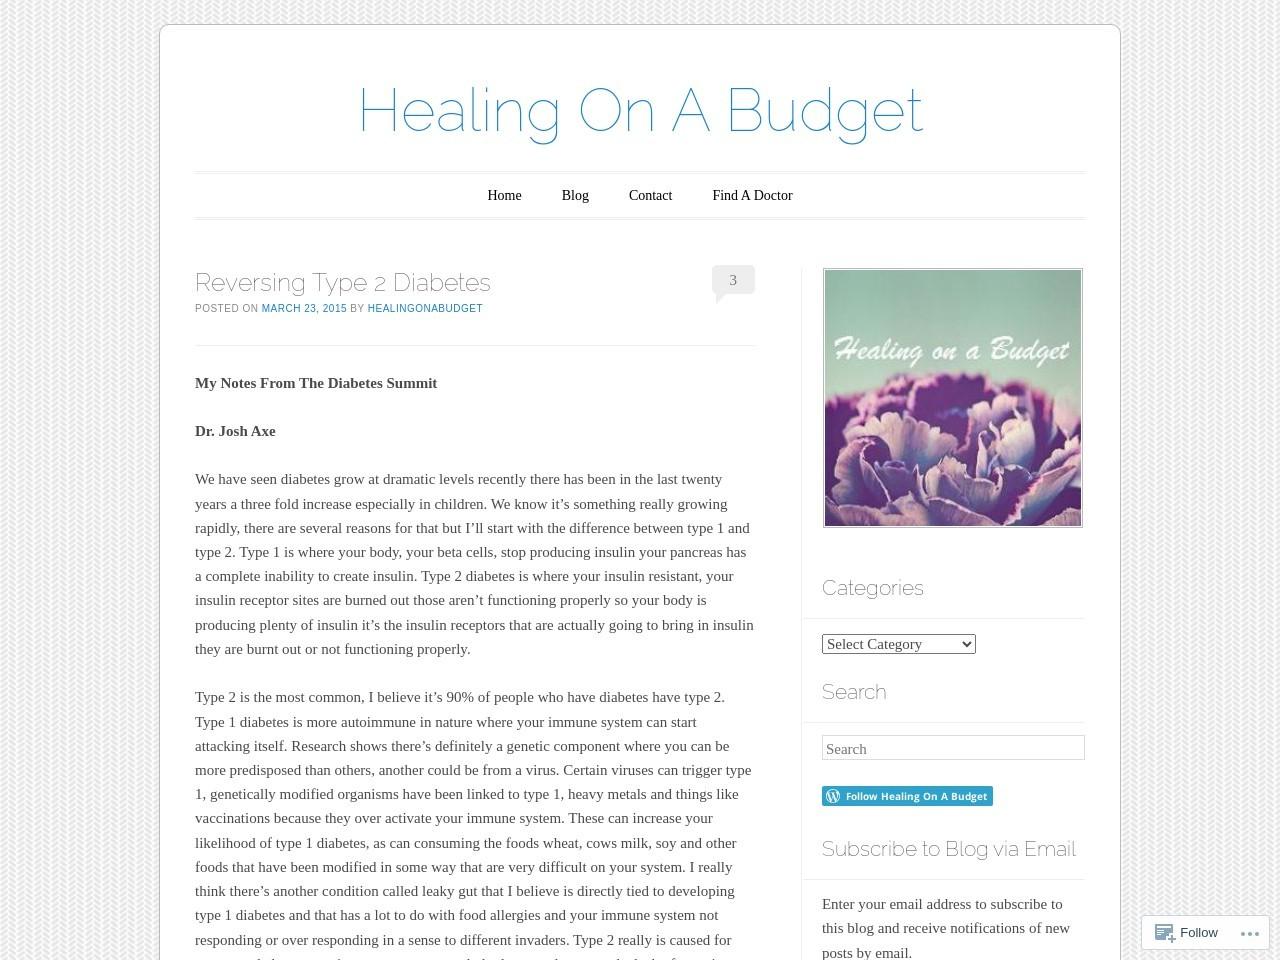 Reversing Type 2 Diabetes | Healing On A Budget